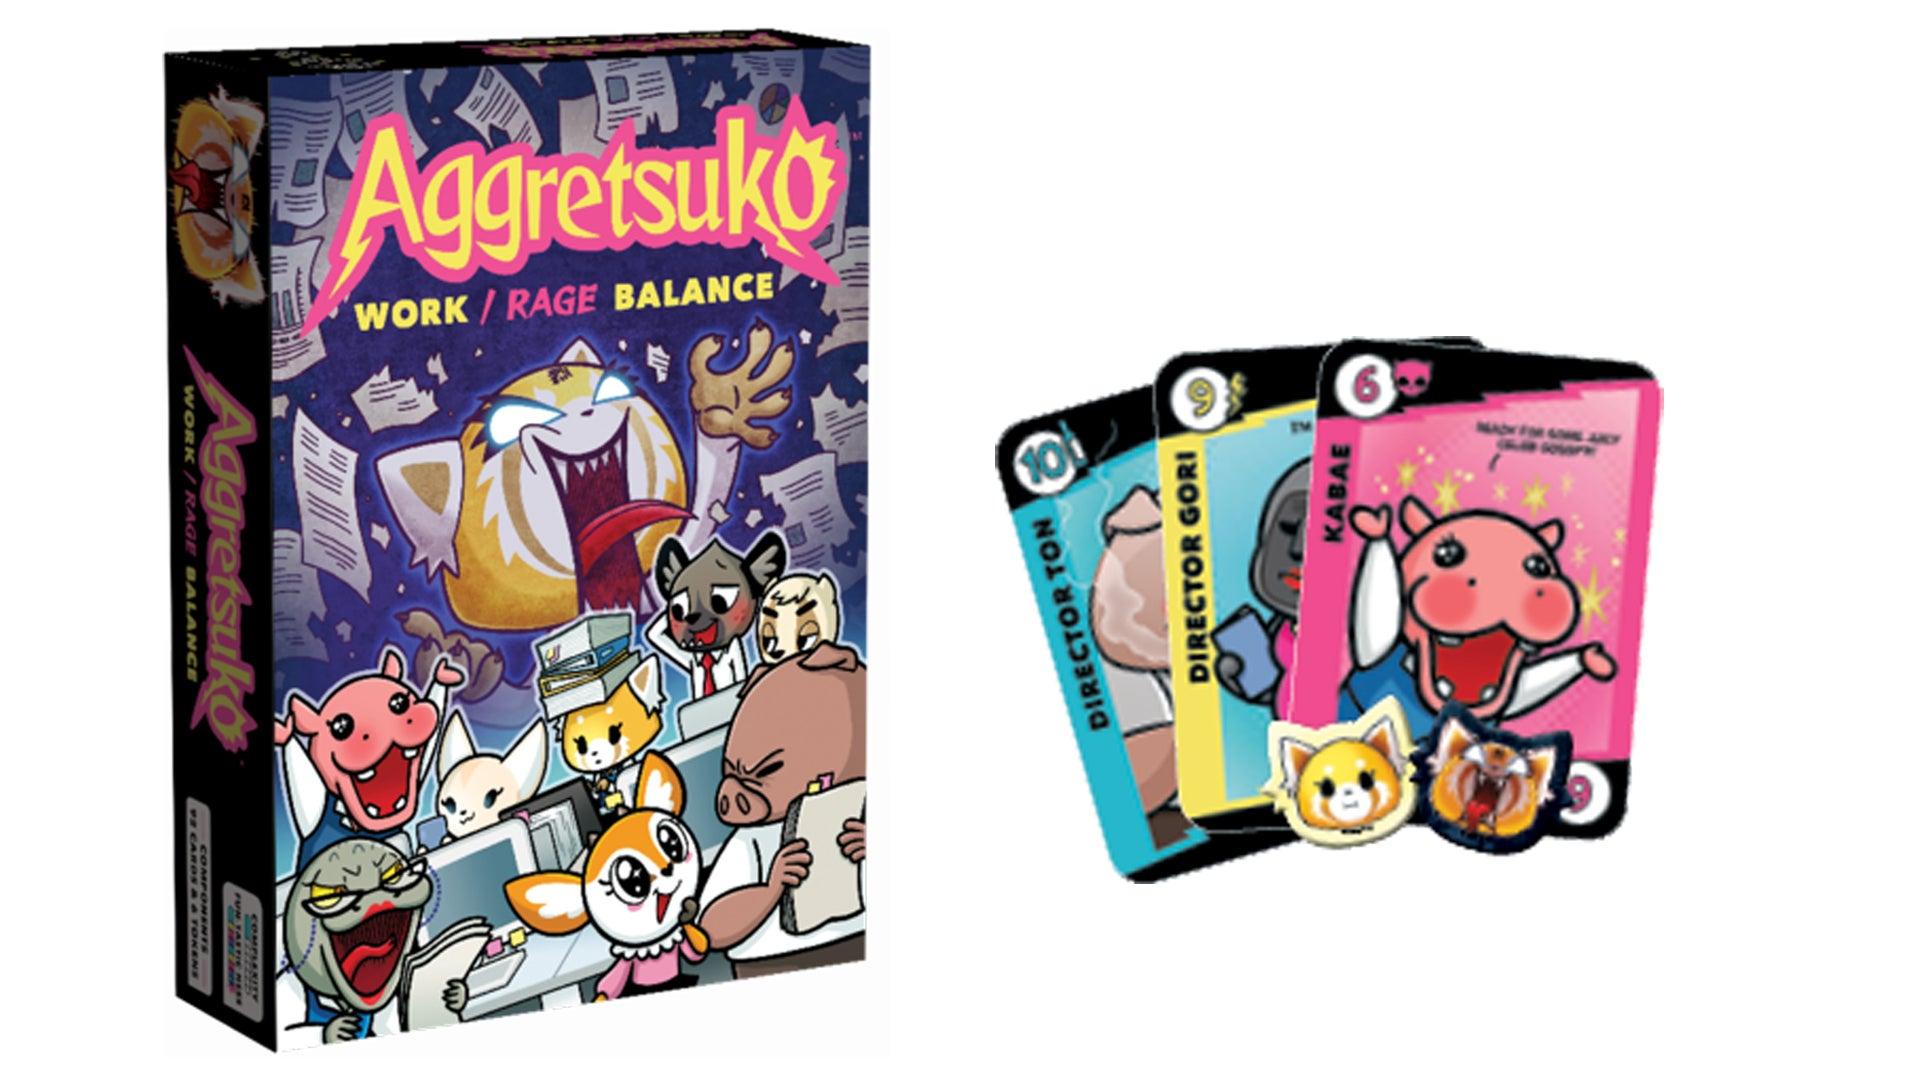 Aggretsuko: Work/Rage Balance board game components and box